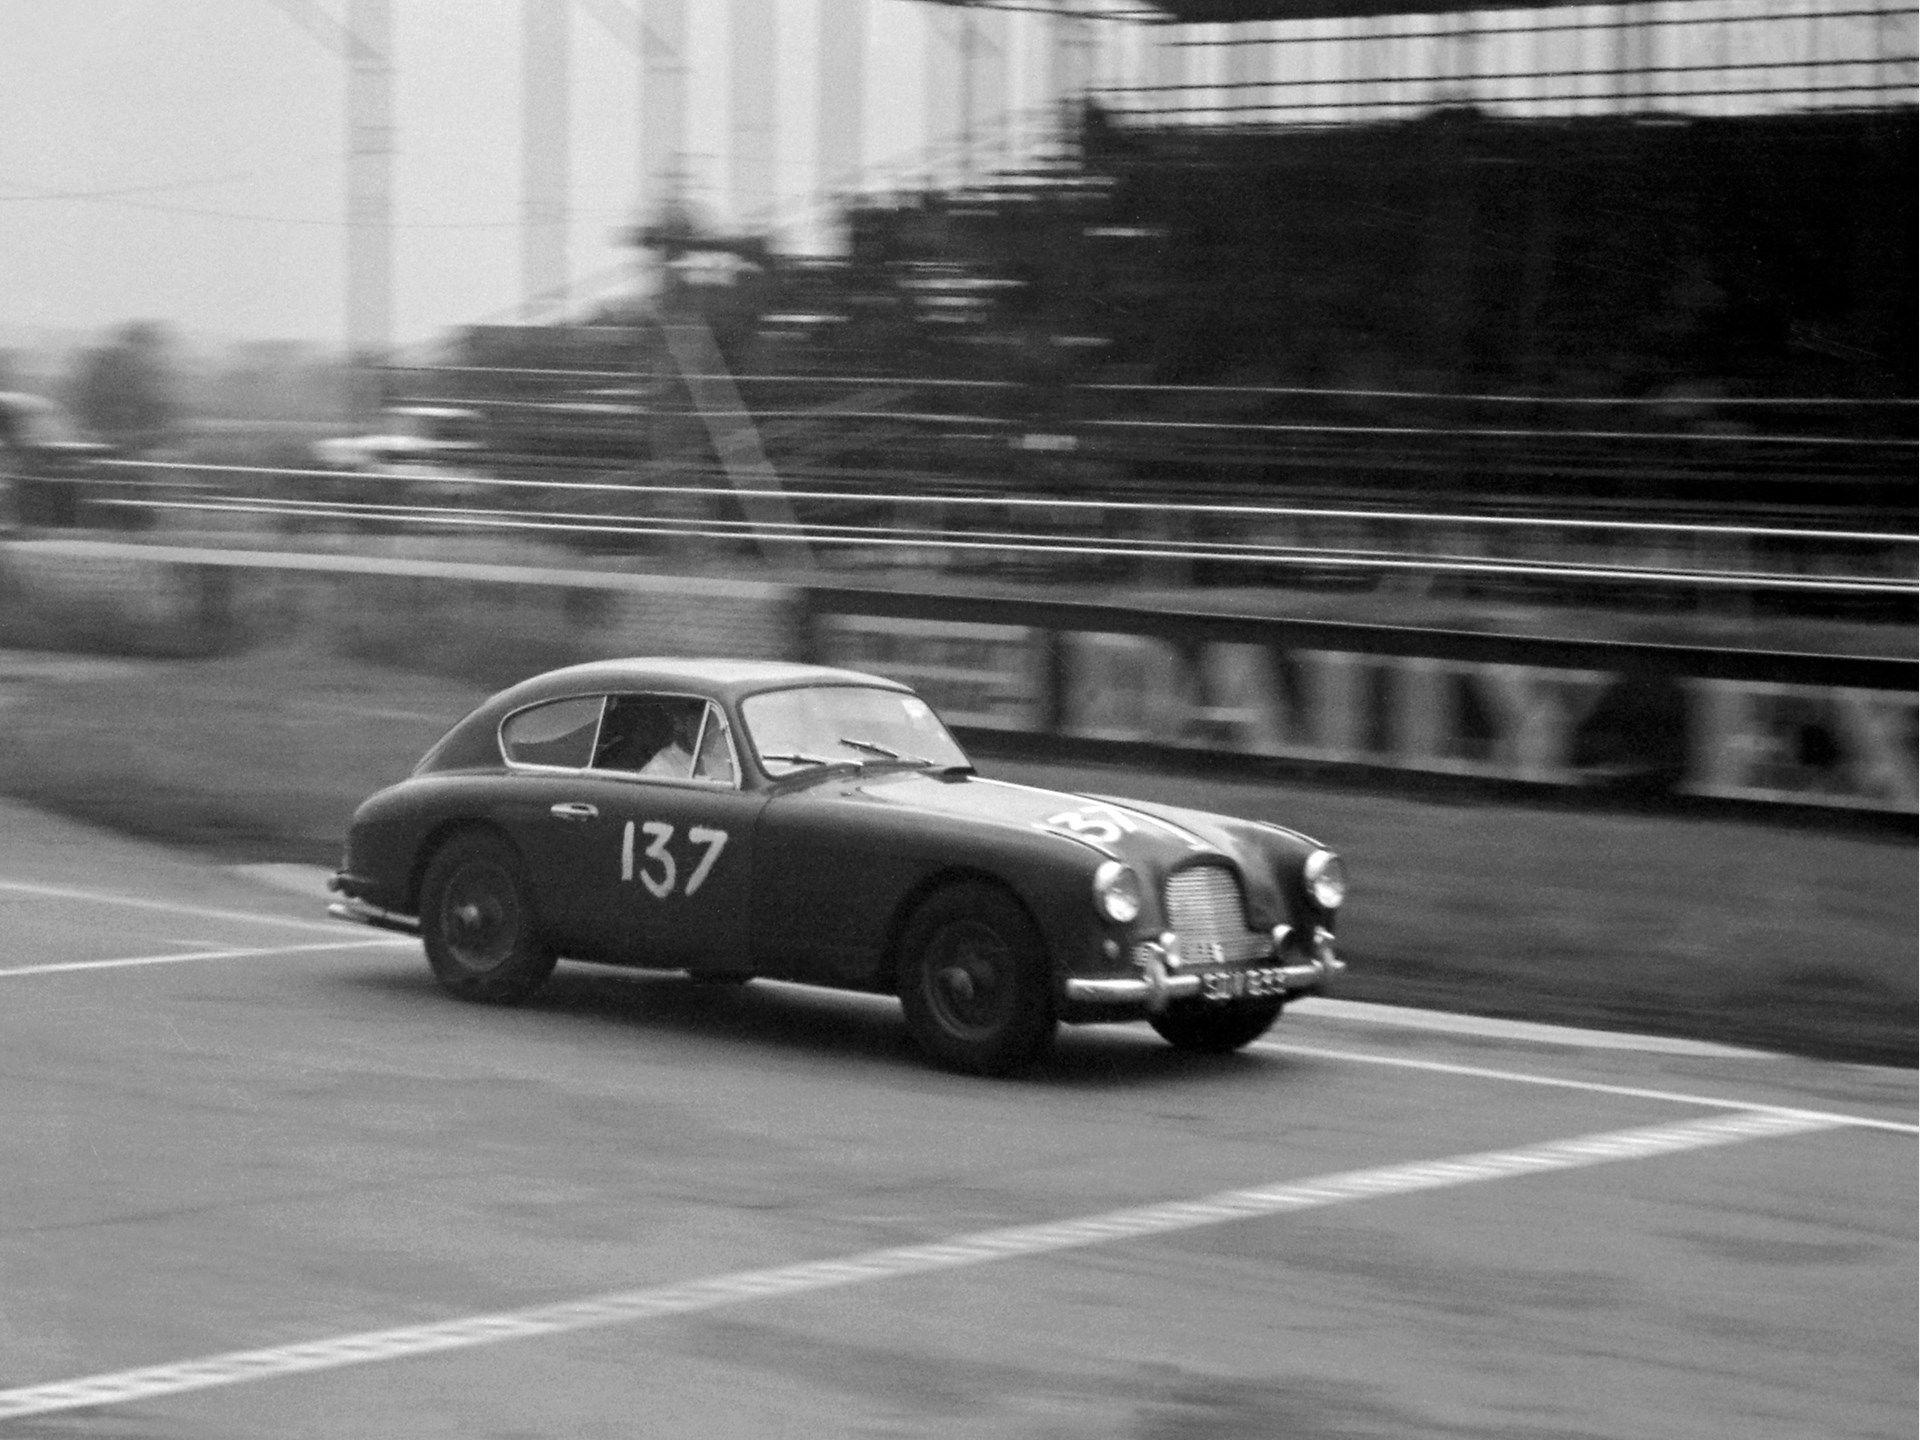 1955 Aston Martin Db2 4 Vin Lml 981 Classic Com